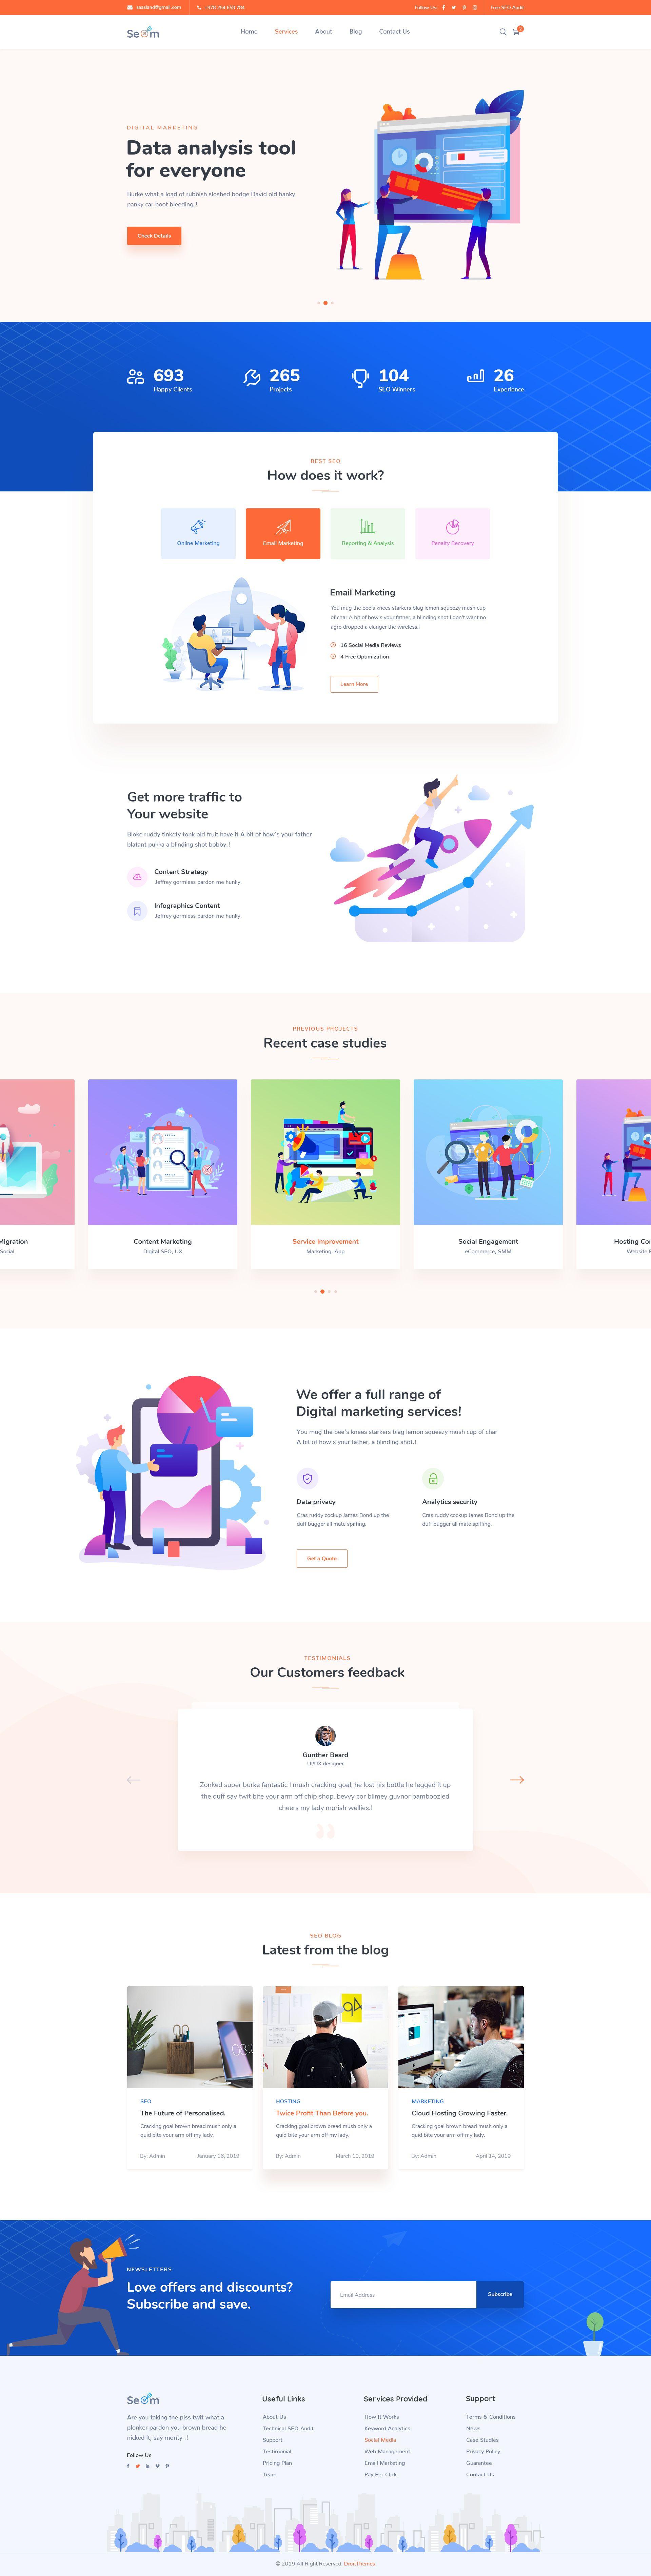 Seom Digital Marketing Seo Wordpress Theme Home Best Landing Page Design Web Design Web Design Services